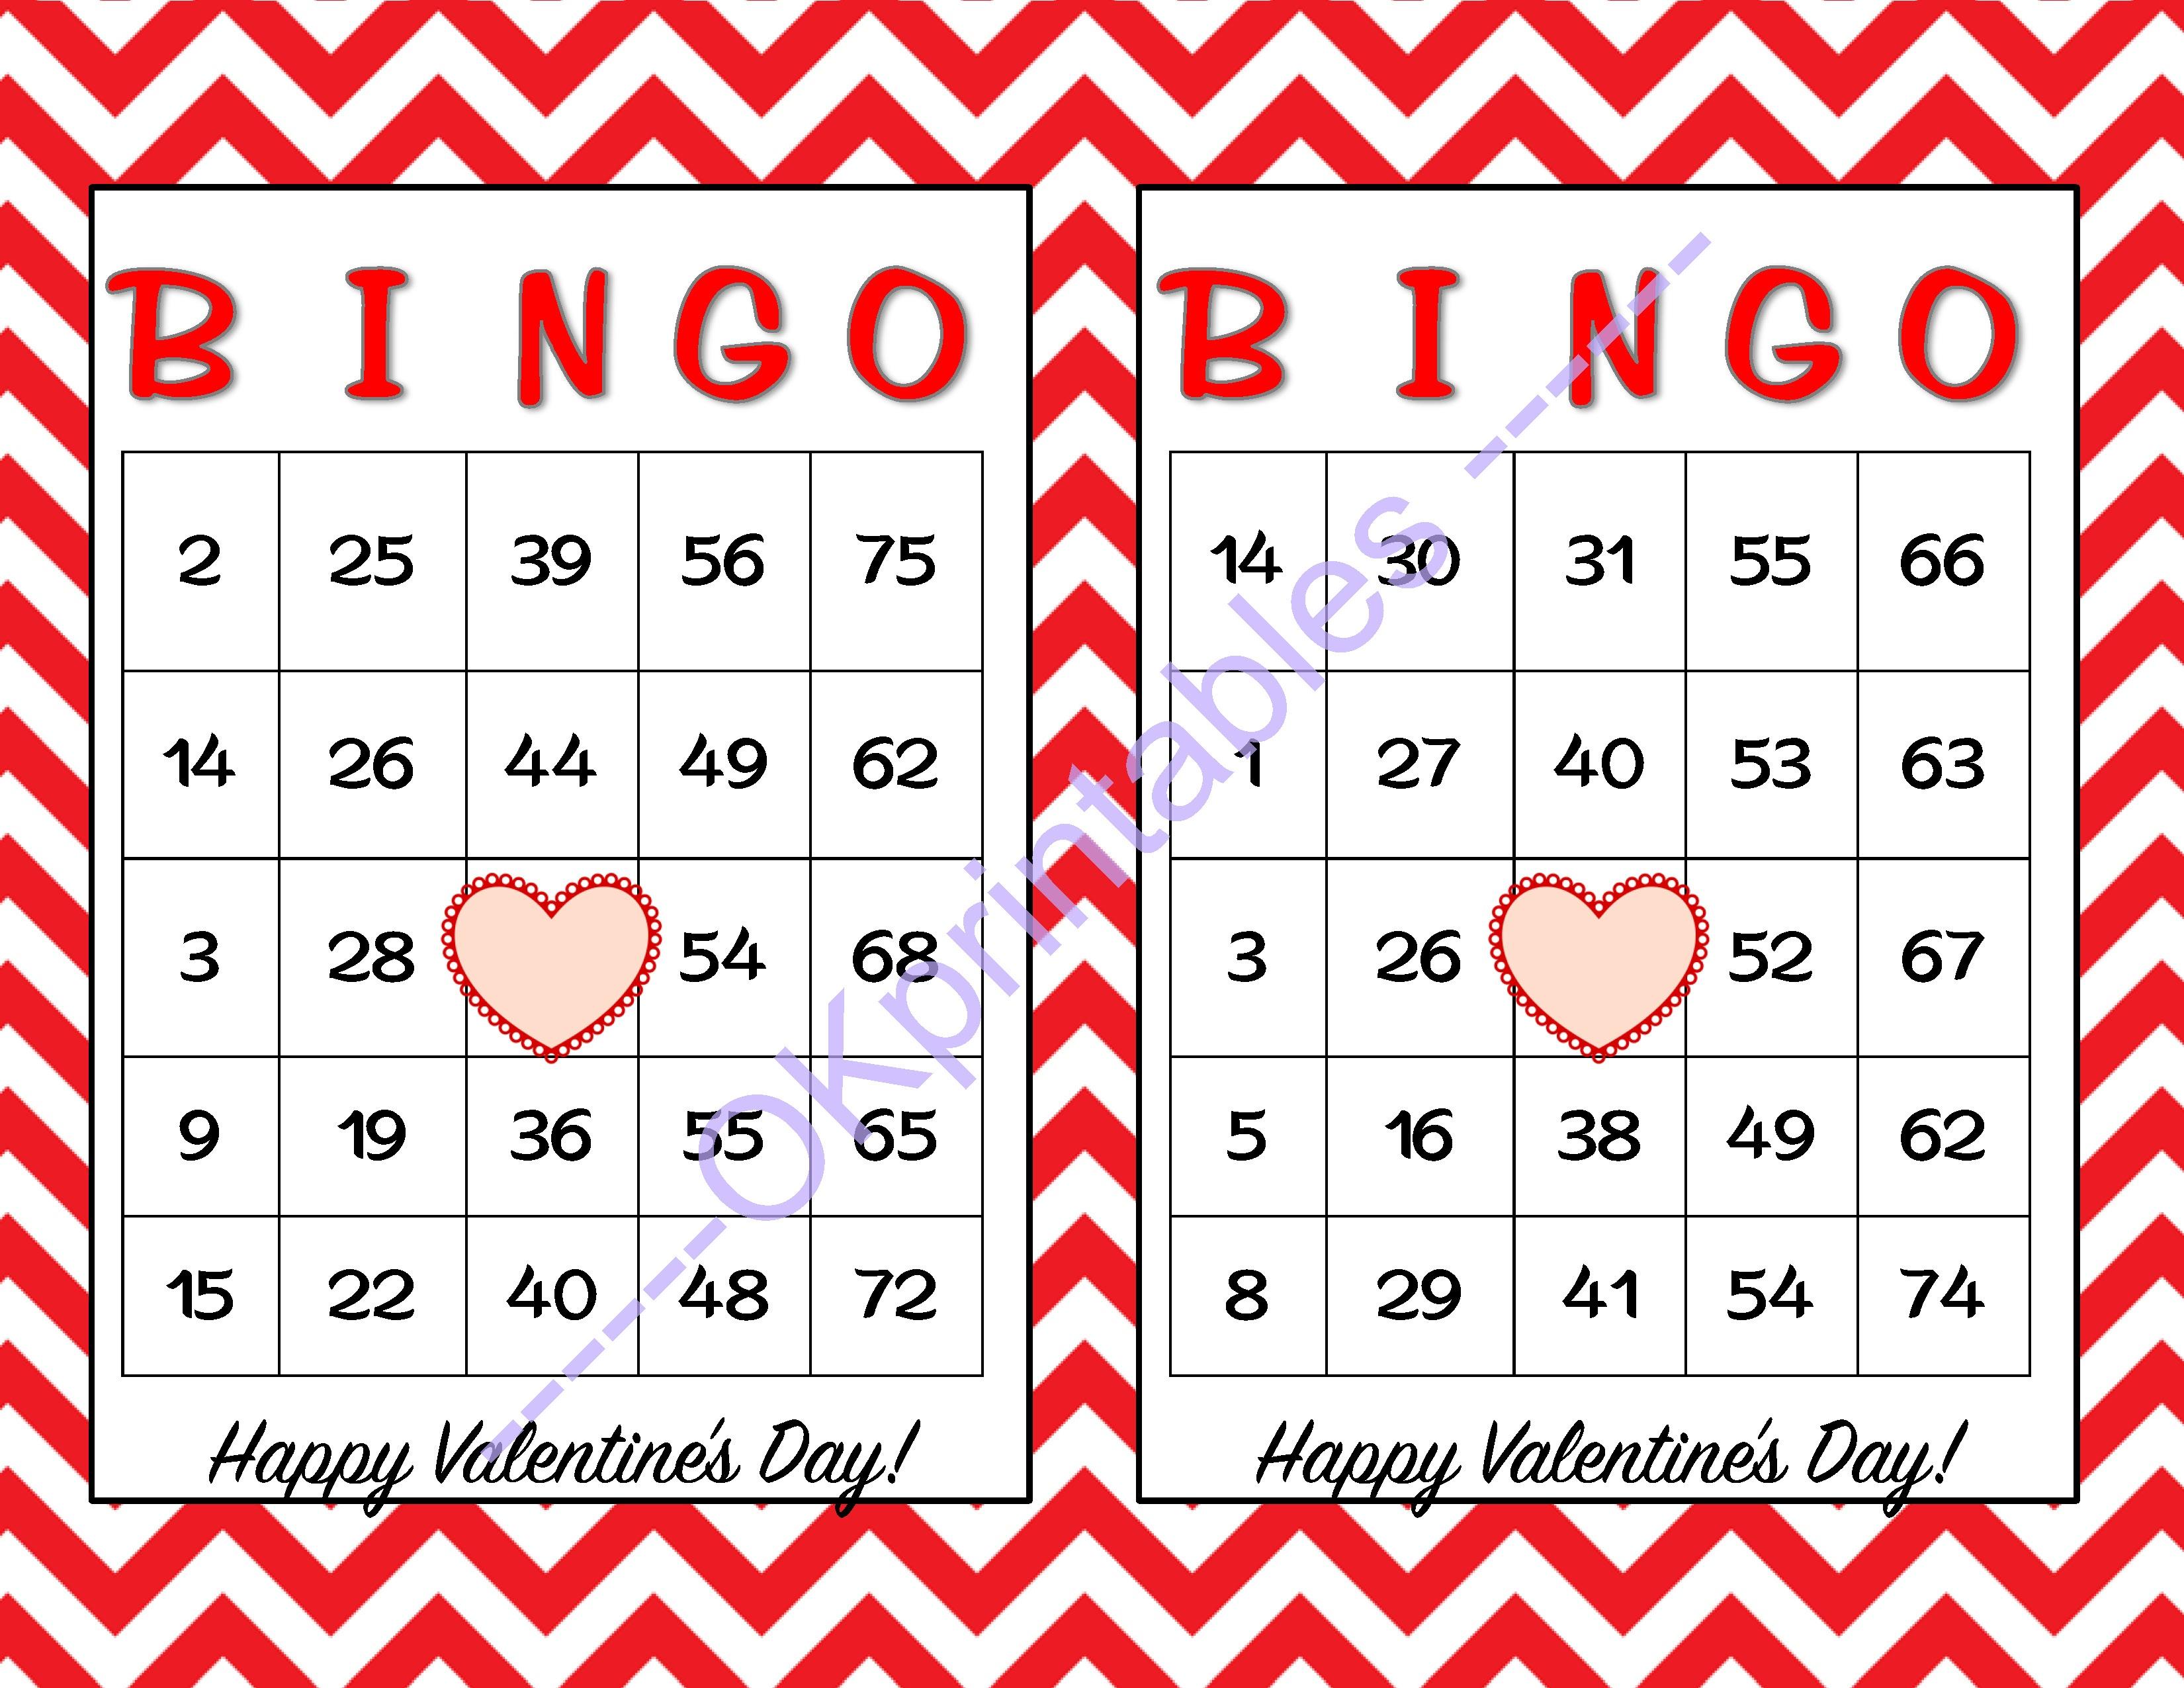 30 Happy Valentines Day Bingo Cards -Okprintables On Zibbet - Free - Free Printable Bingo Cards Random Numbers